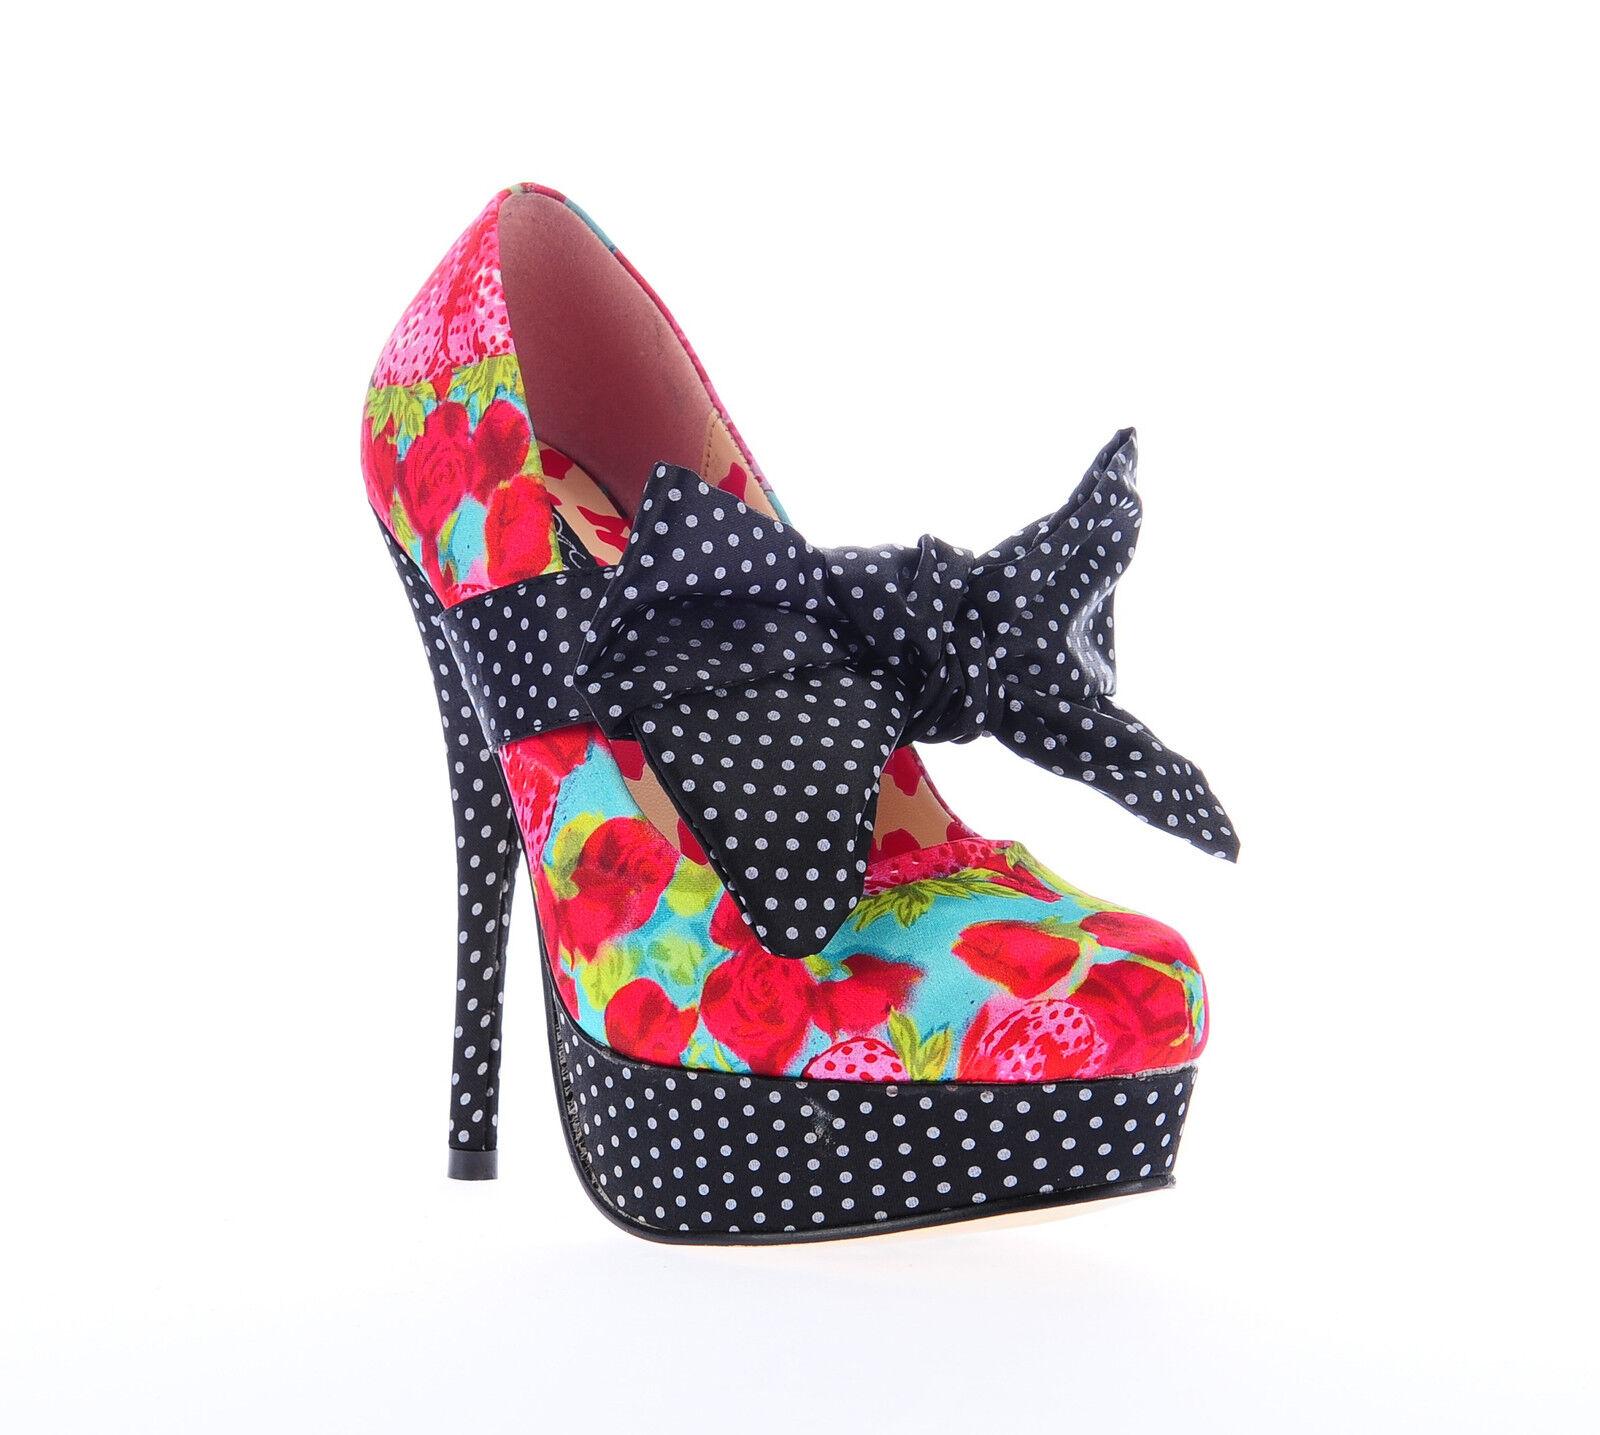 IRON FIST Schuhe Pumps Indecent Obsession Platform Girls - Größe wählbar